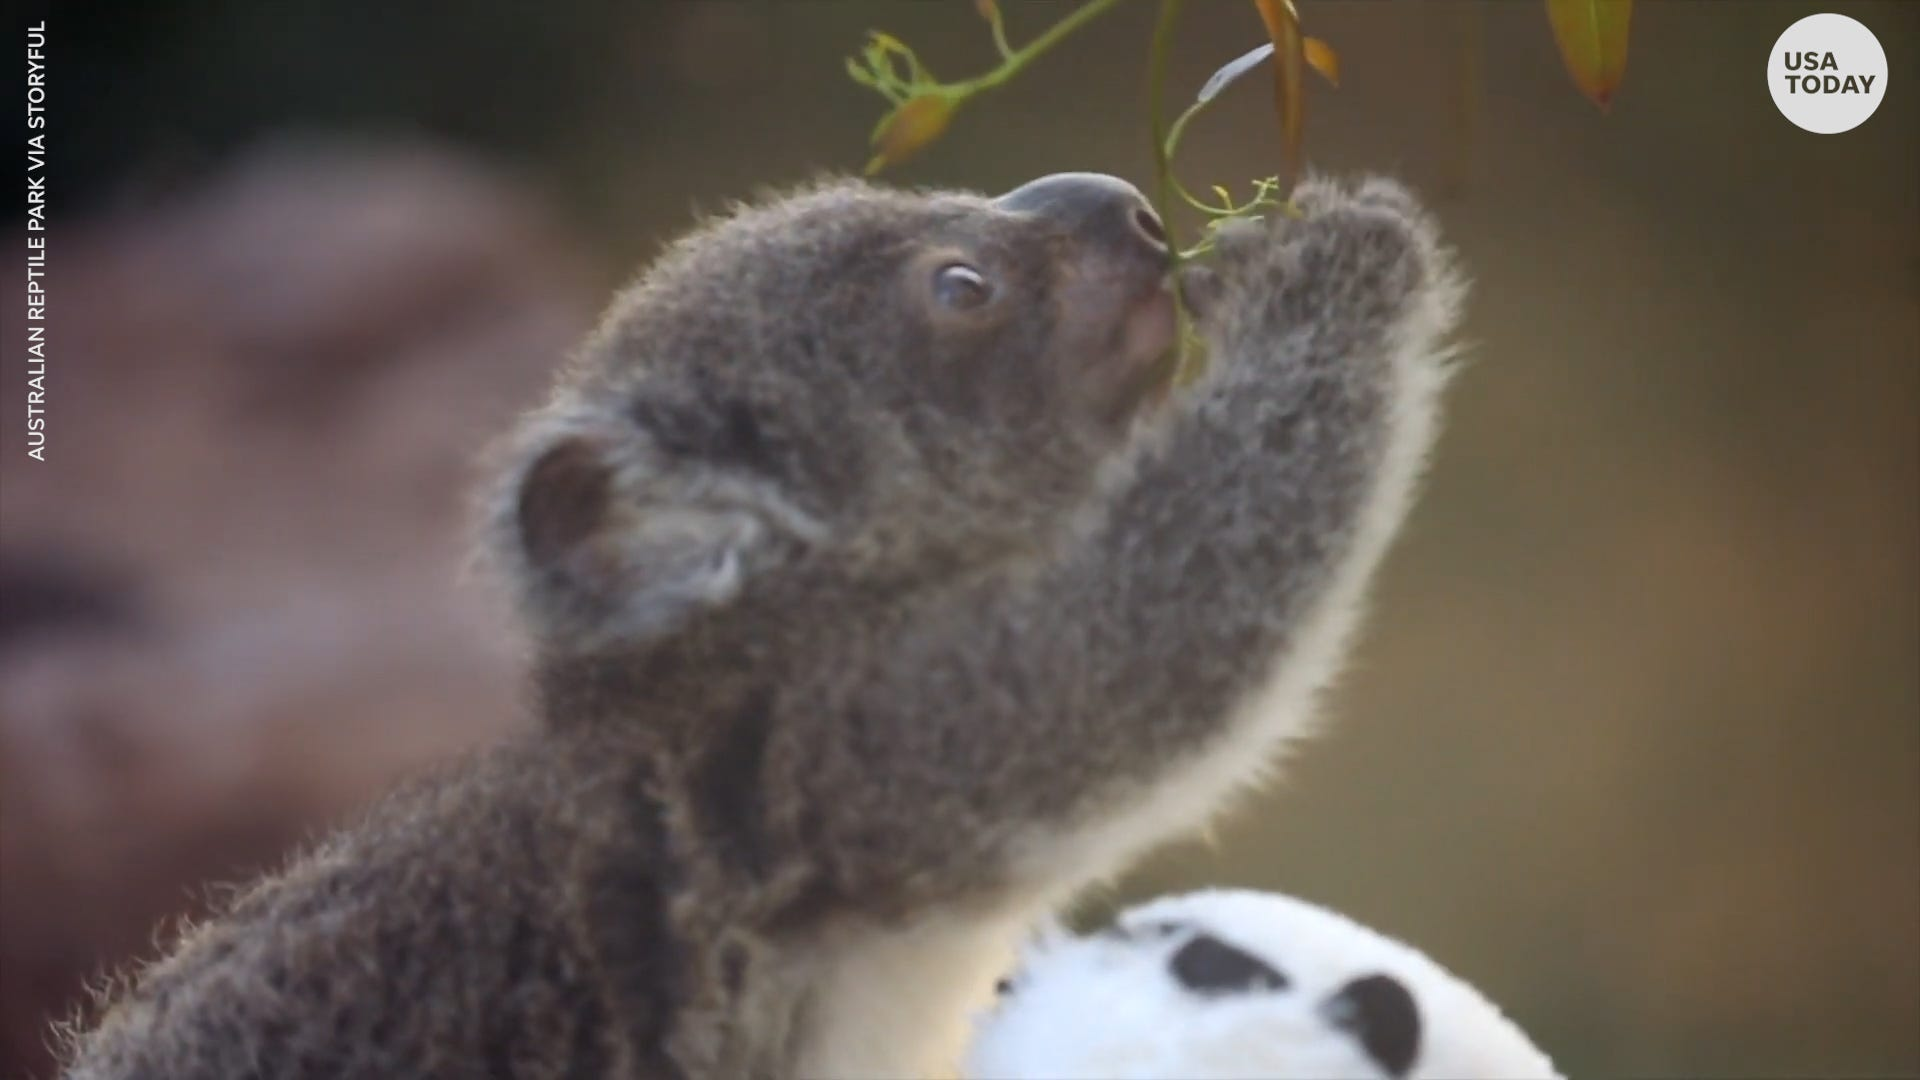 Wildlife sanctuary celebrates successful koala breeding season after devastating bushfires